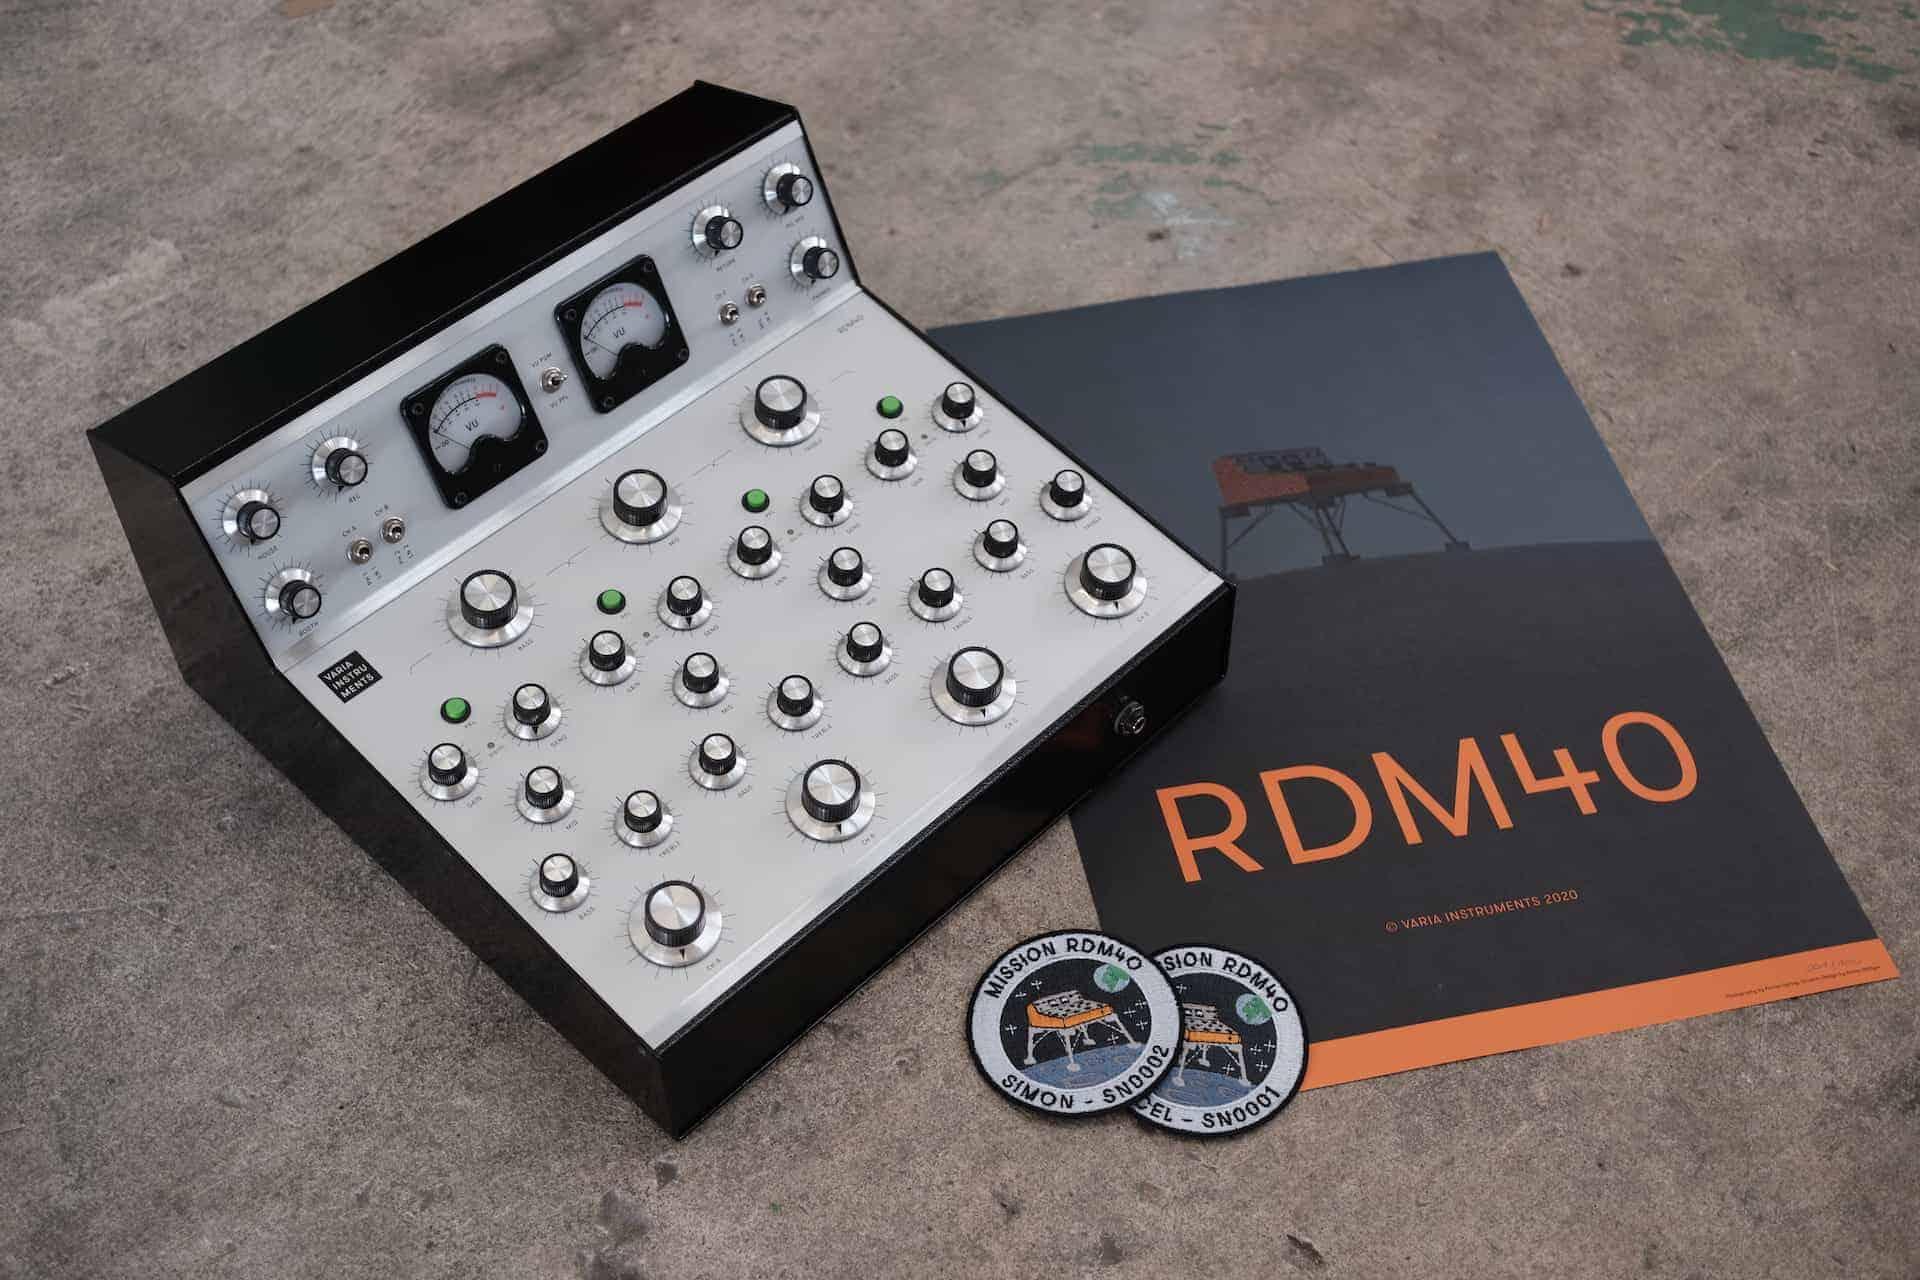 RDM40 – Mixer by Varia Instruments